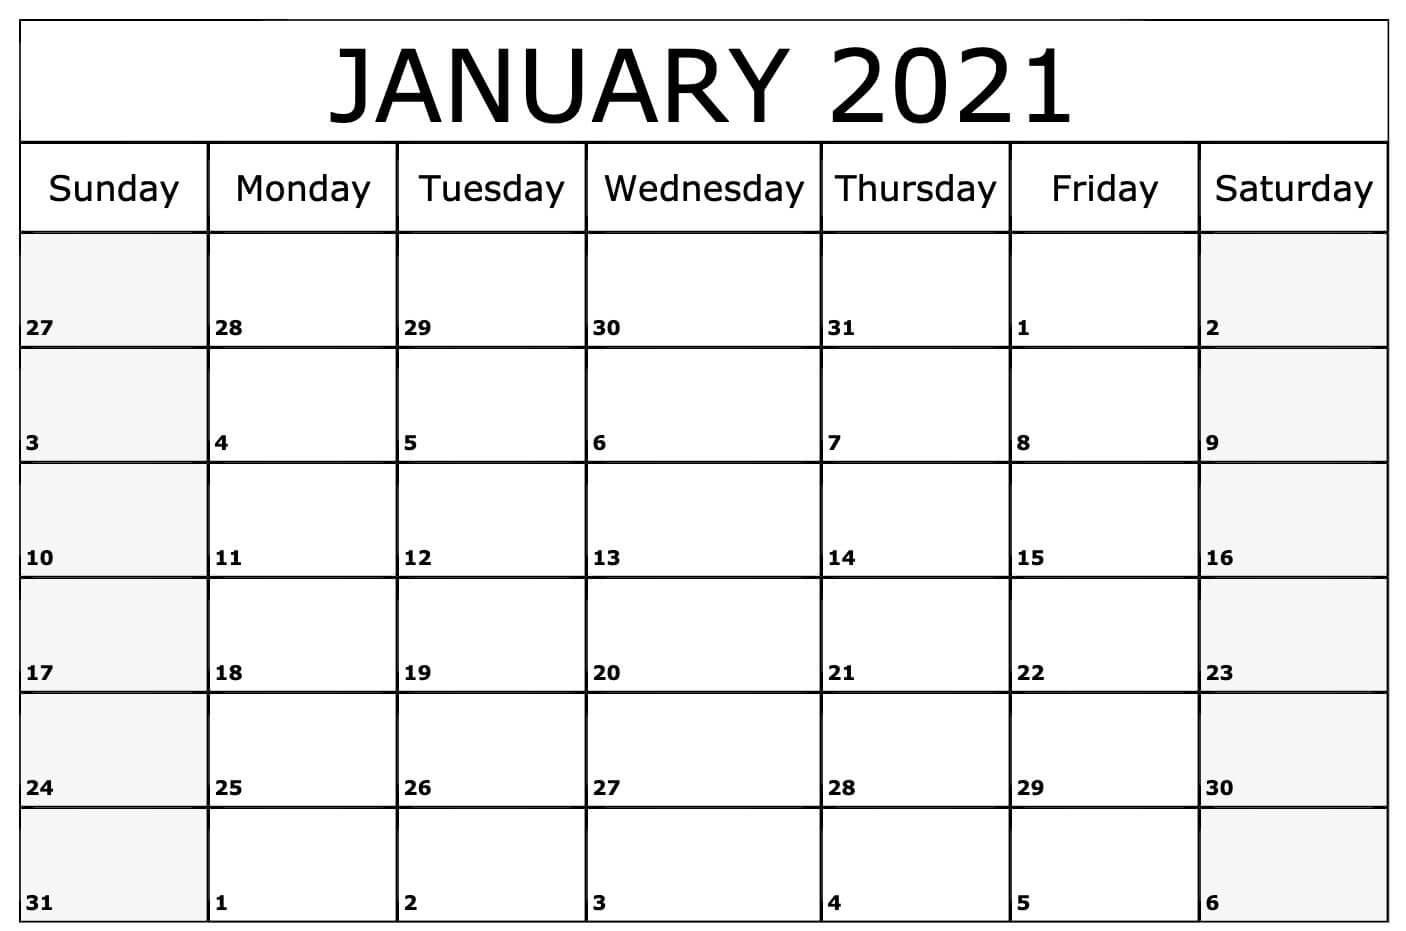 Blank January 2021 Calendar Pdf, Word, Excel Template  Word January 2021 Template